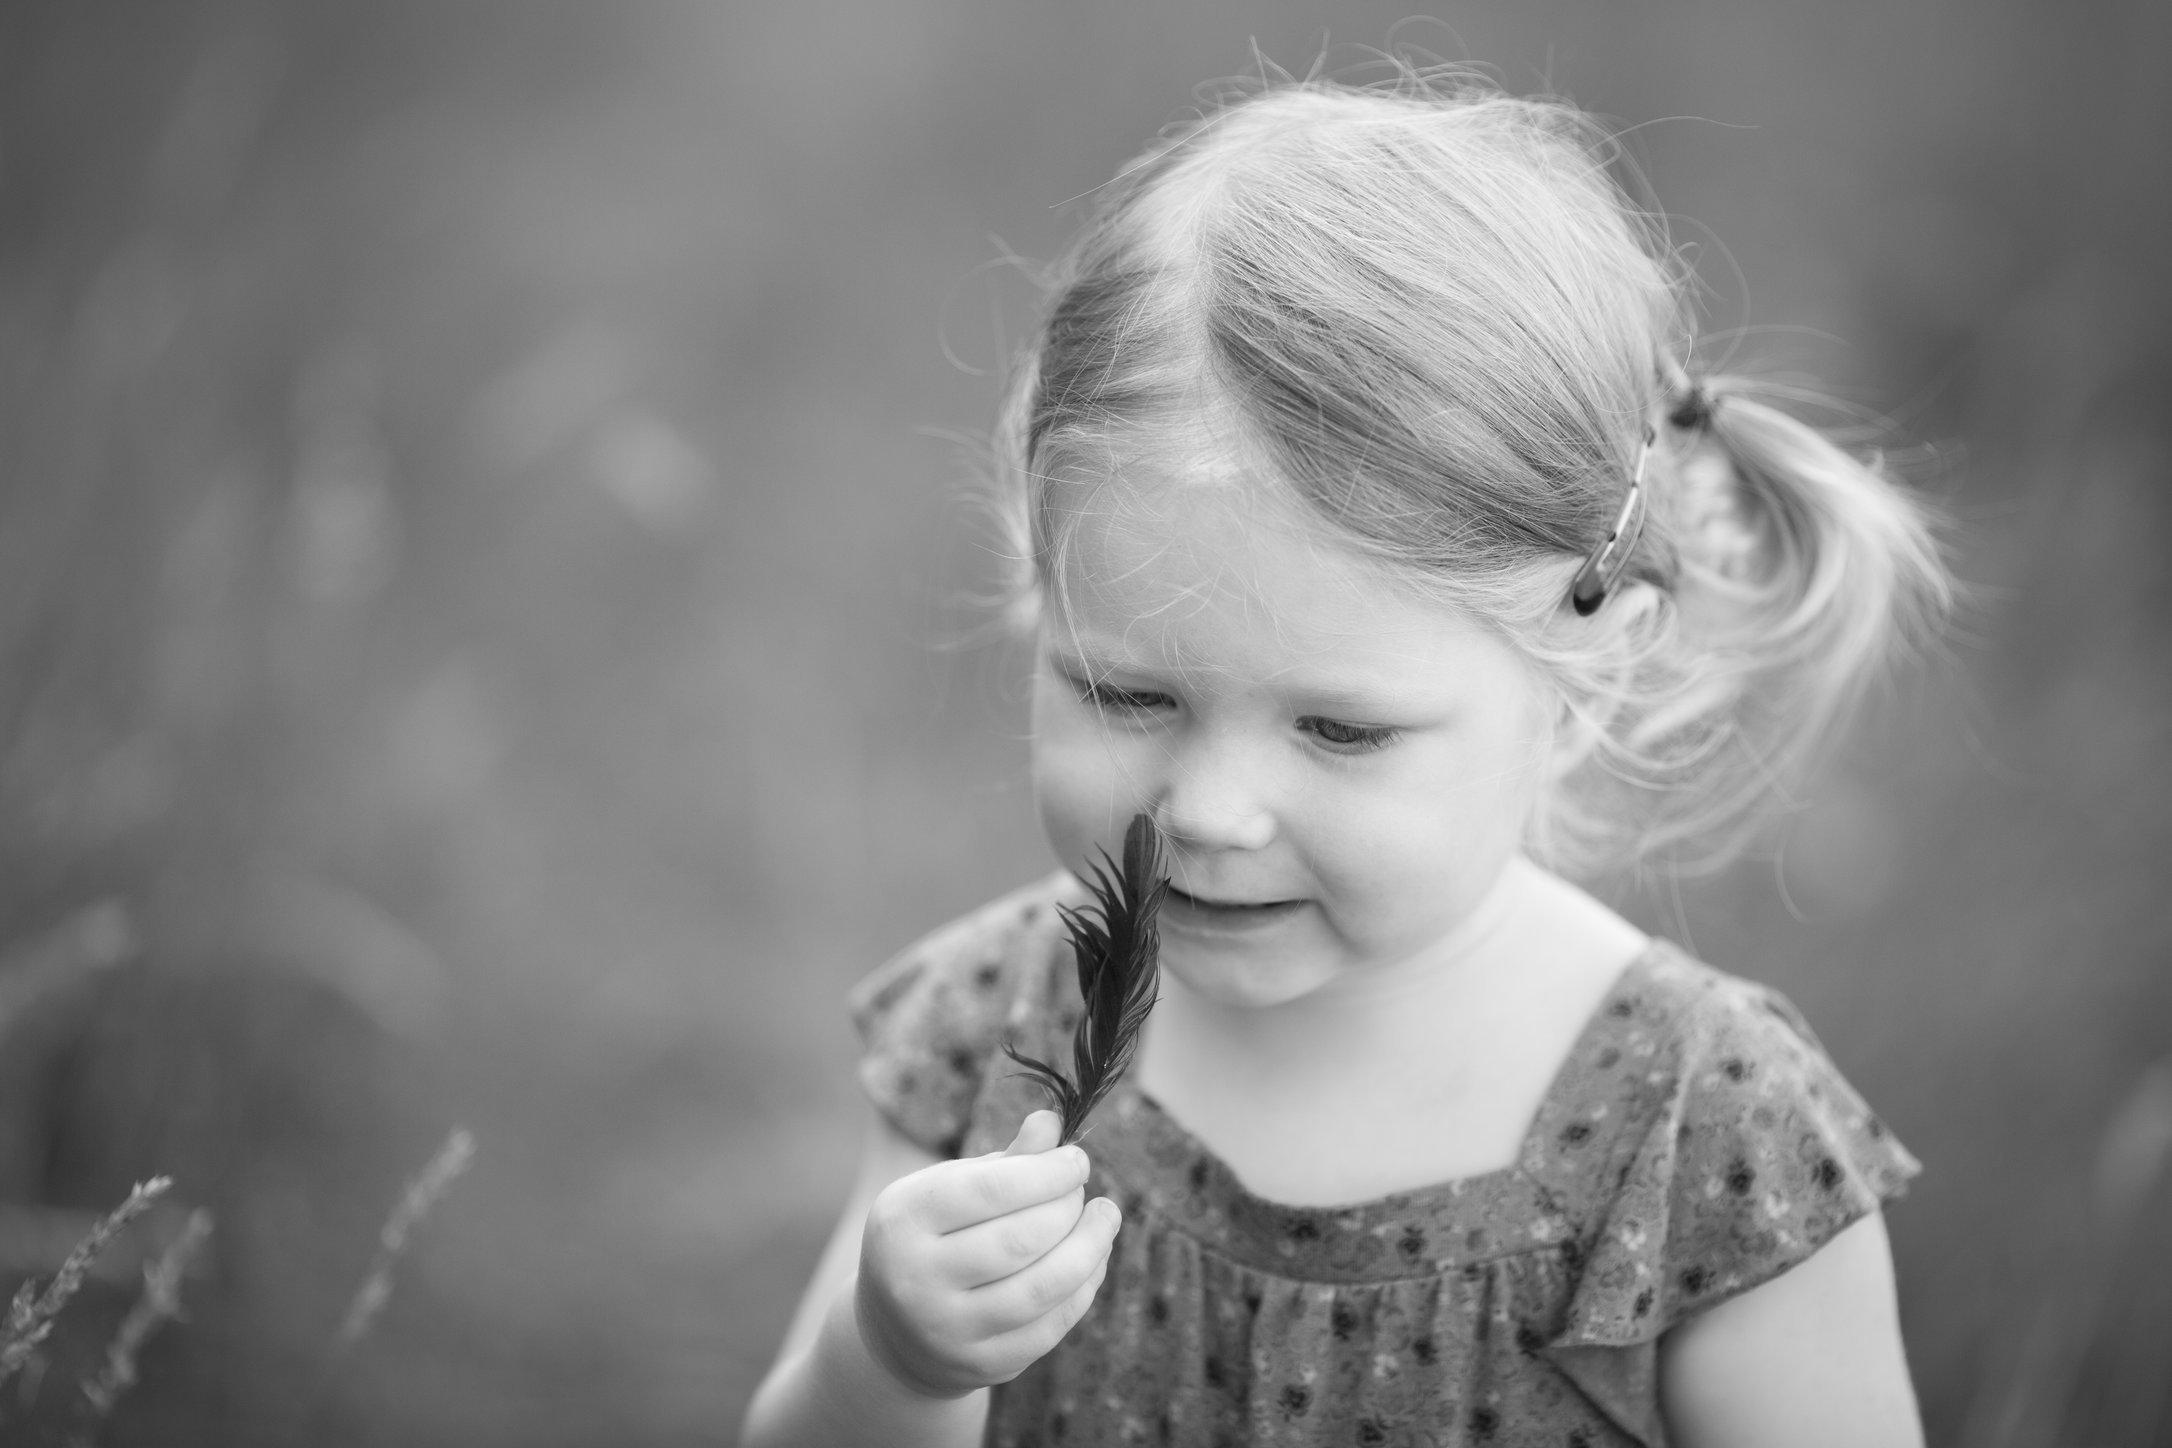 Portretfoto kind met veer - © Janneke Walter, kinderfotograaf omgeving Utrecht